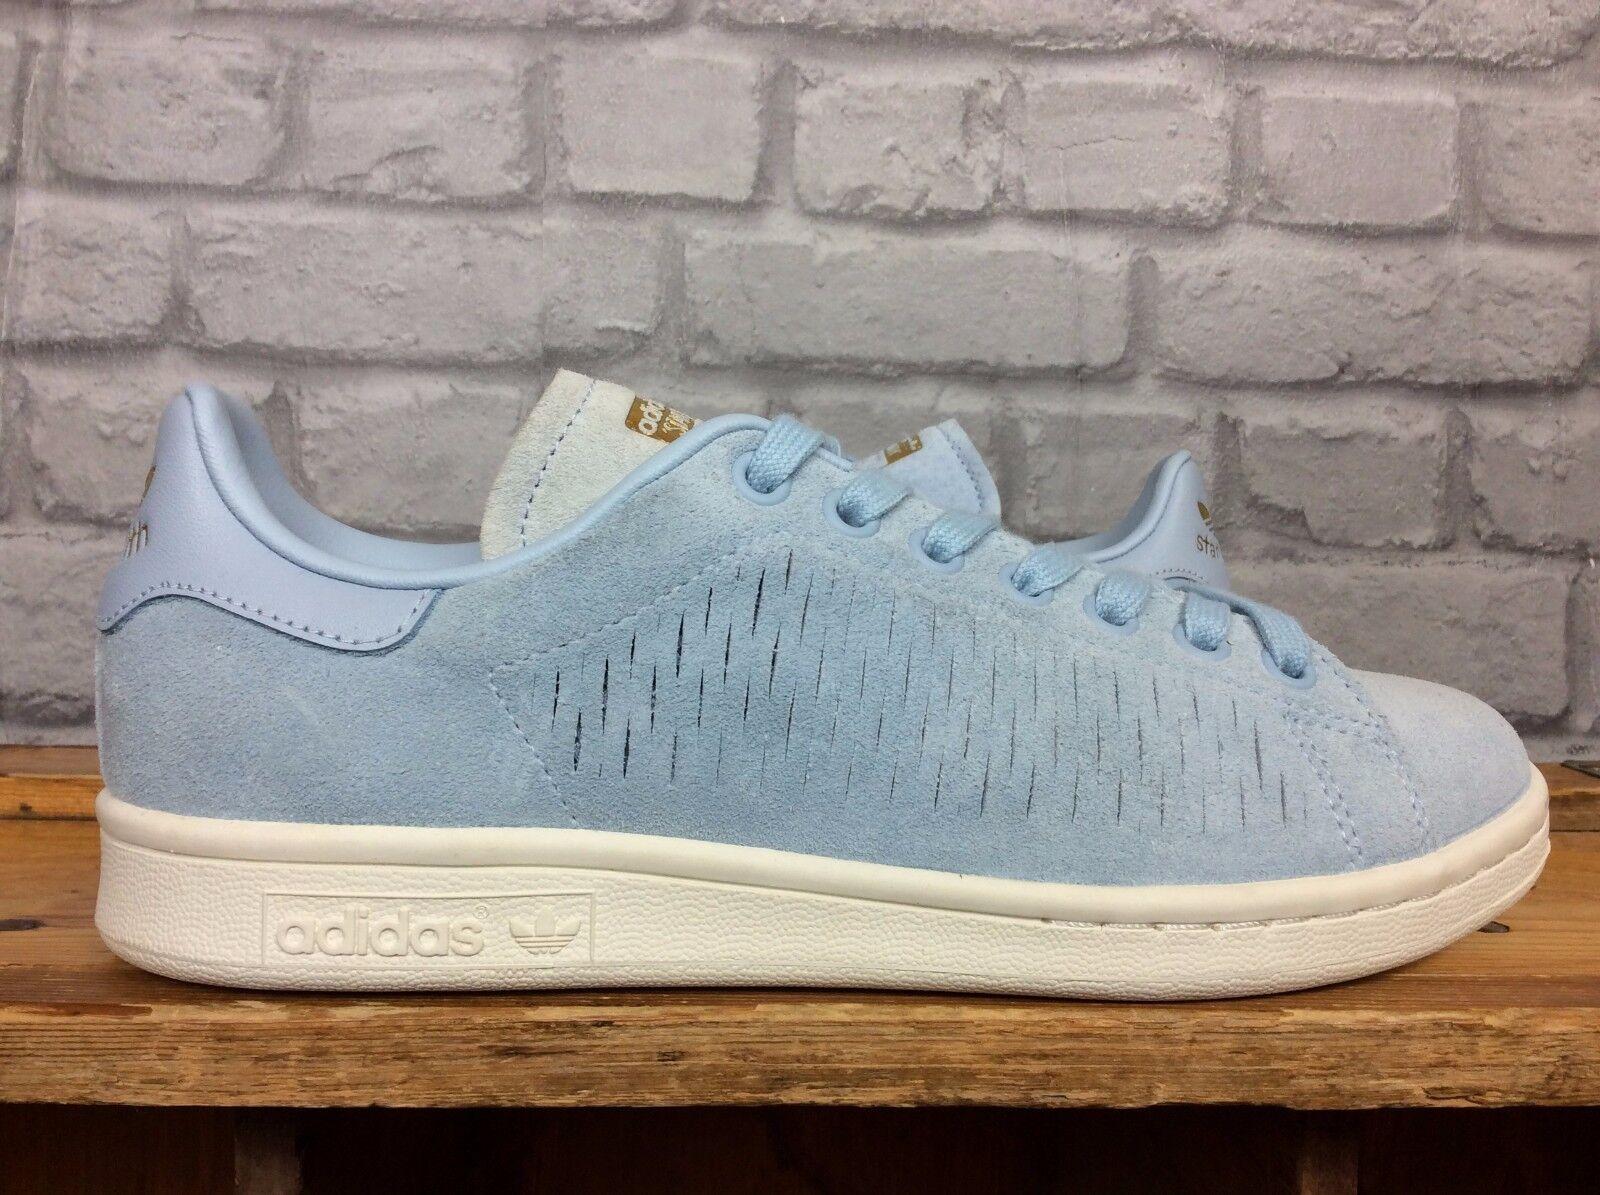 Adidas Femmes UK bleu 5 EU 38 daim bleu UK Stan Smith Baskets be7a6f